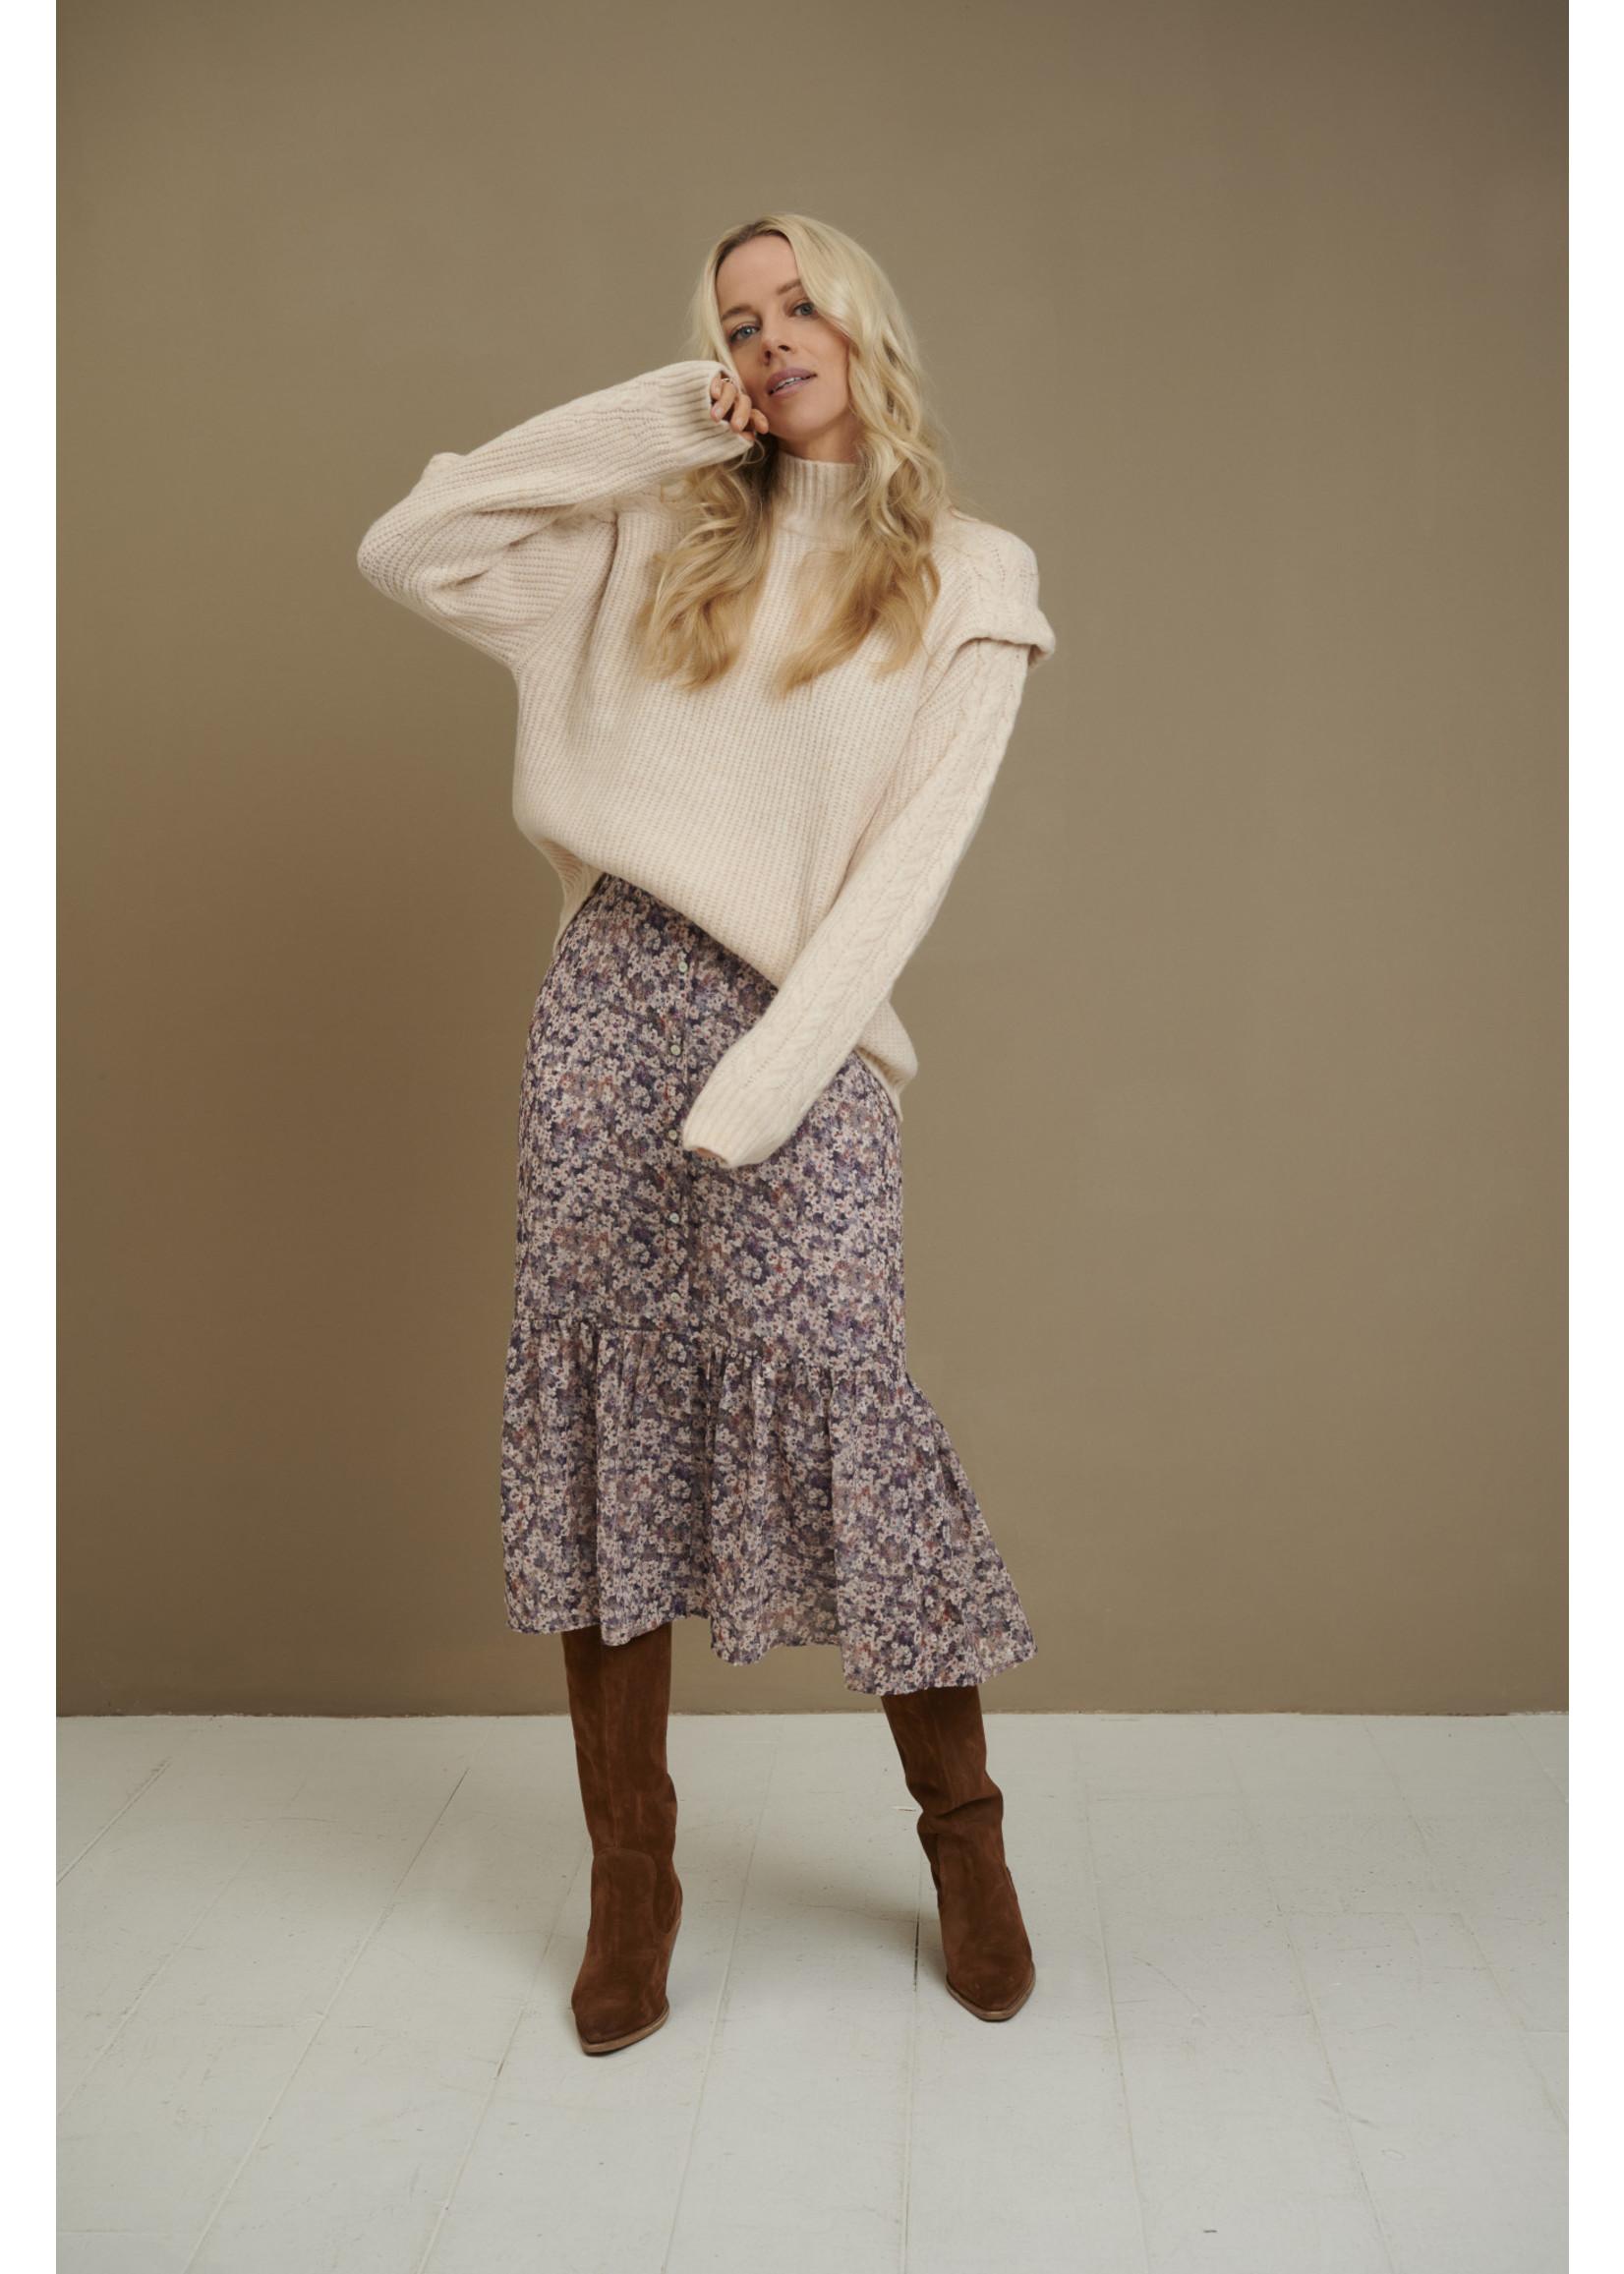 Esqualo Skirt buttoned closure lilac floral